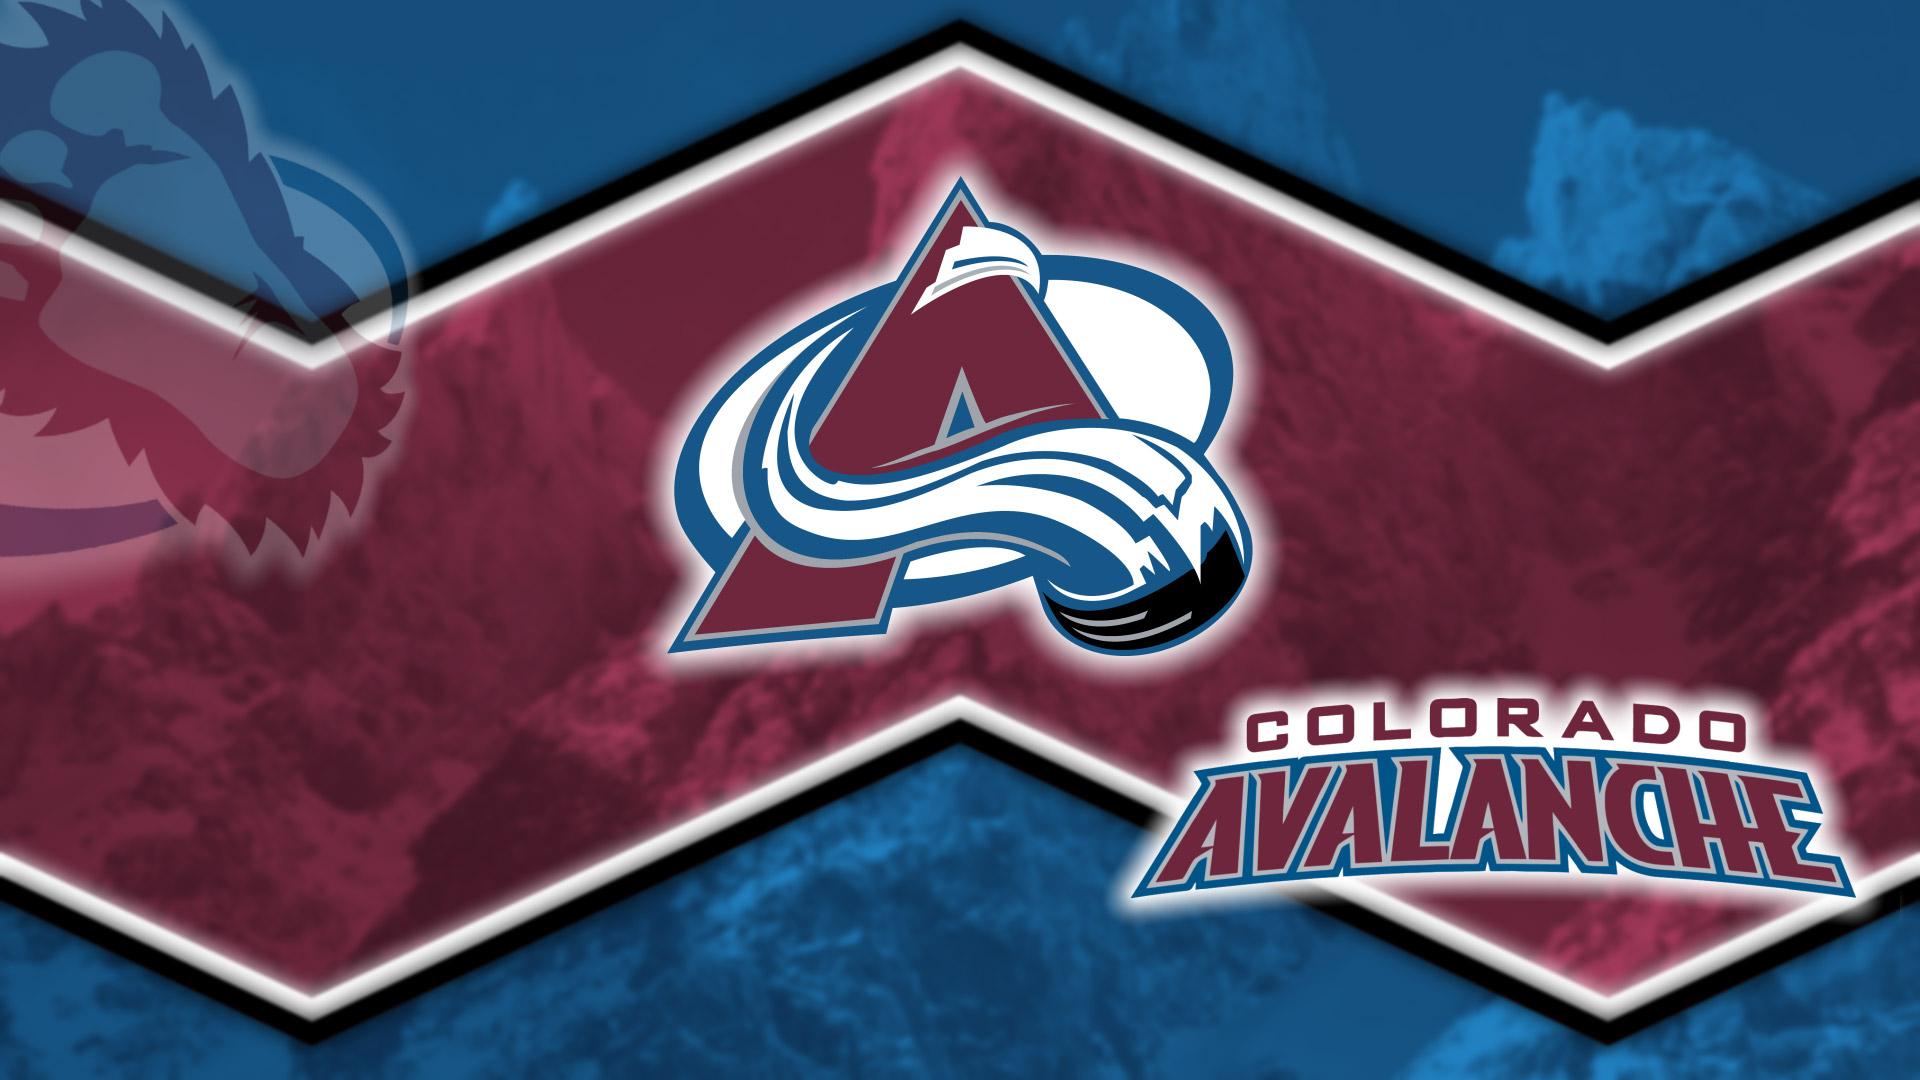 NHL Wallpapers   Colorado Avalanche Logo wallpaper 1920x1080